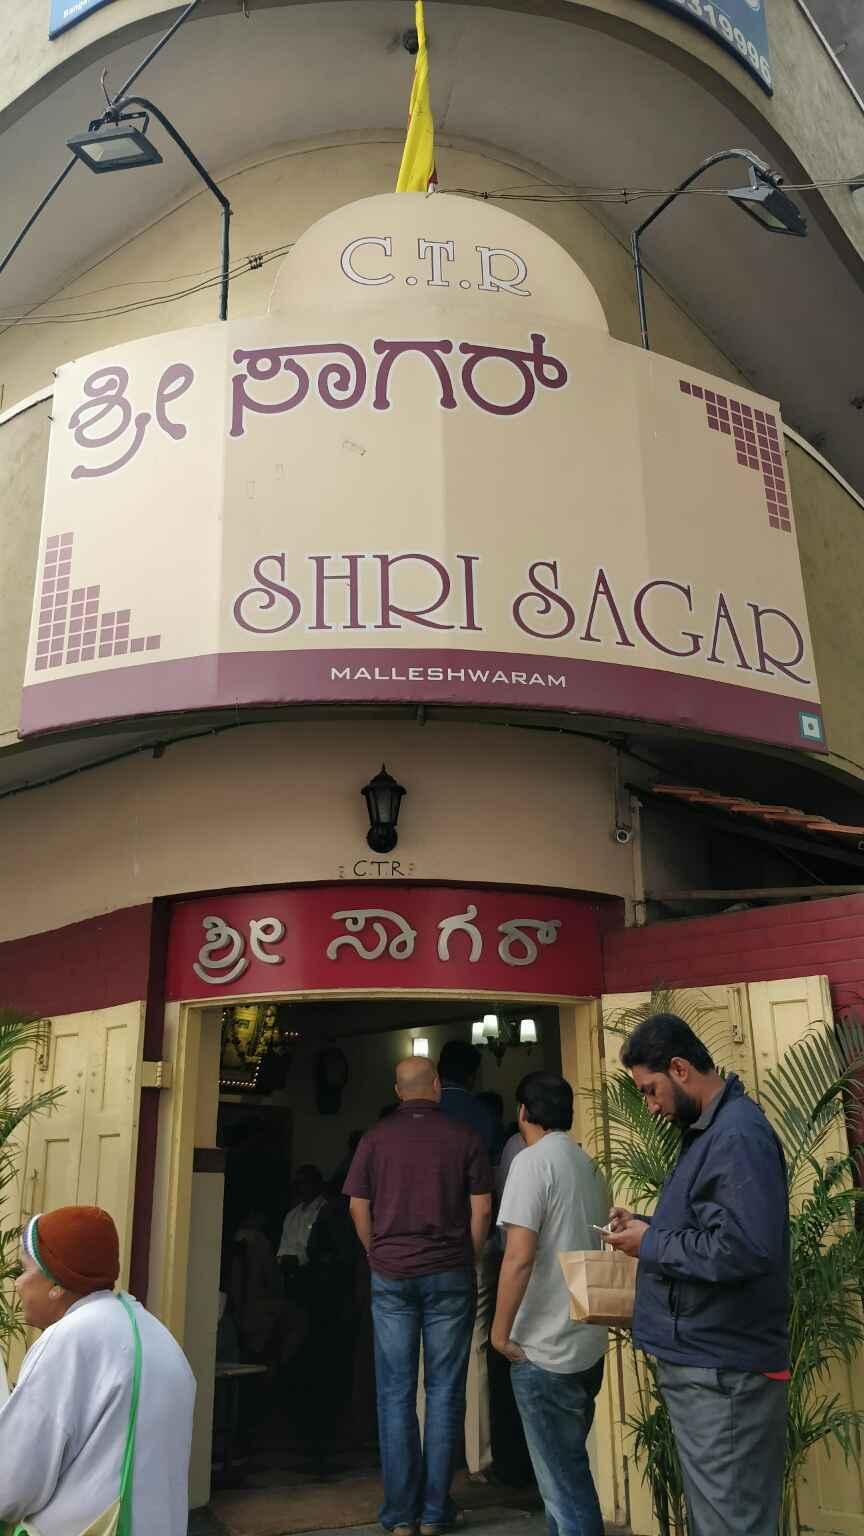 """Central Tiffin Room or Shri Sagar Hotel"" in Bengaluru. #breakfastspots #IWillGoAnywhereForFood"